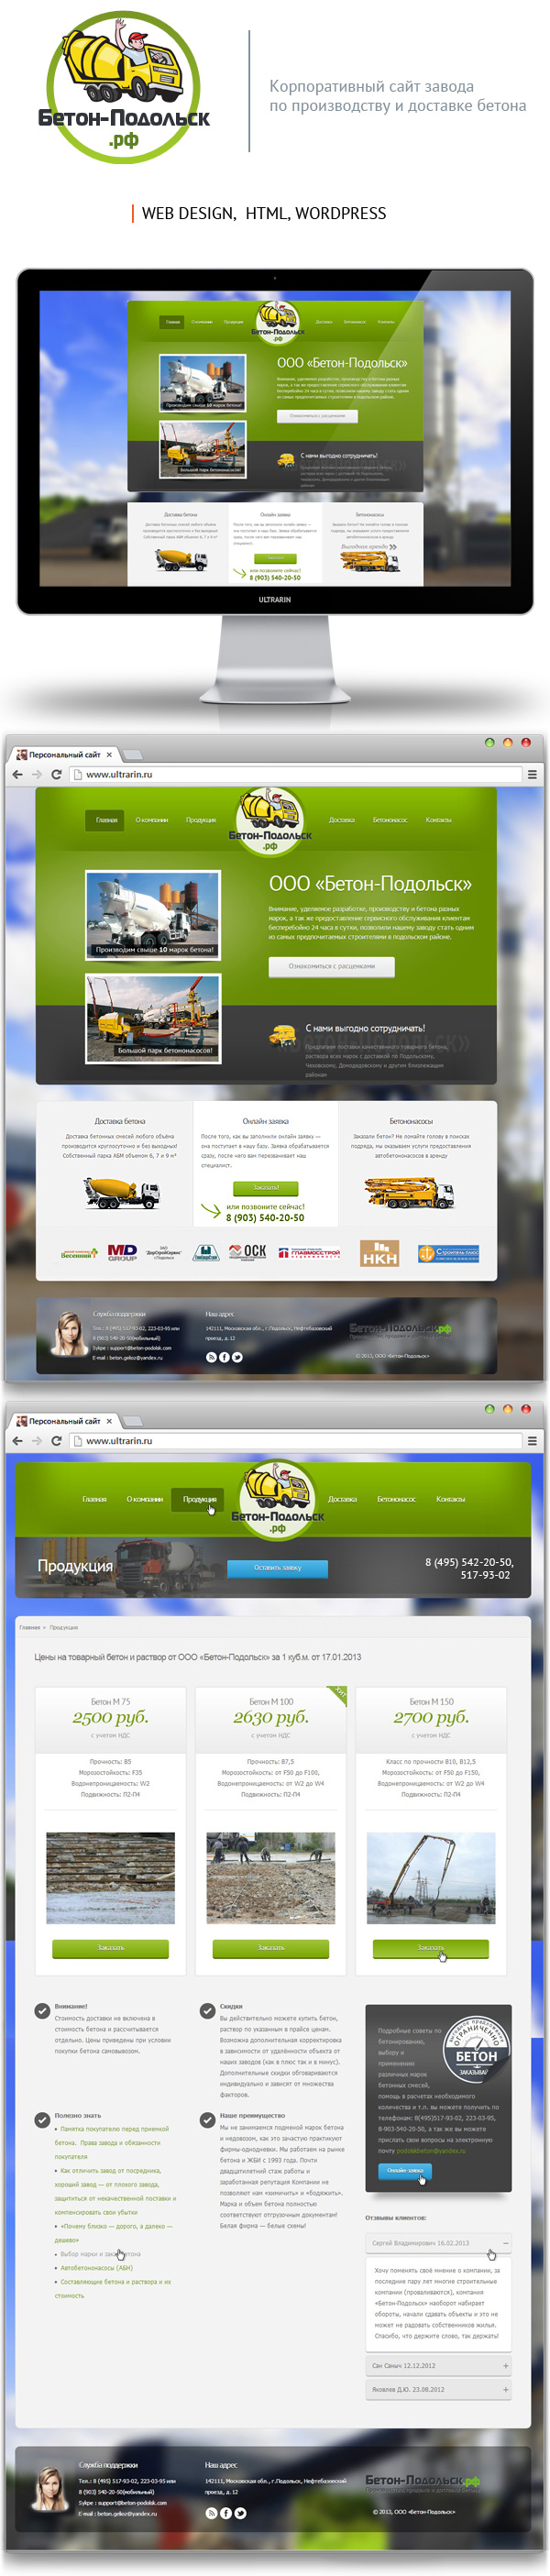 сайт продажи и доставки бетона